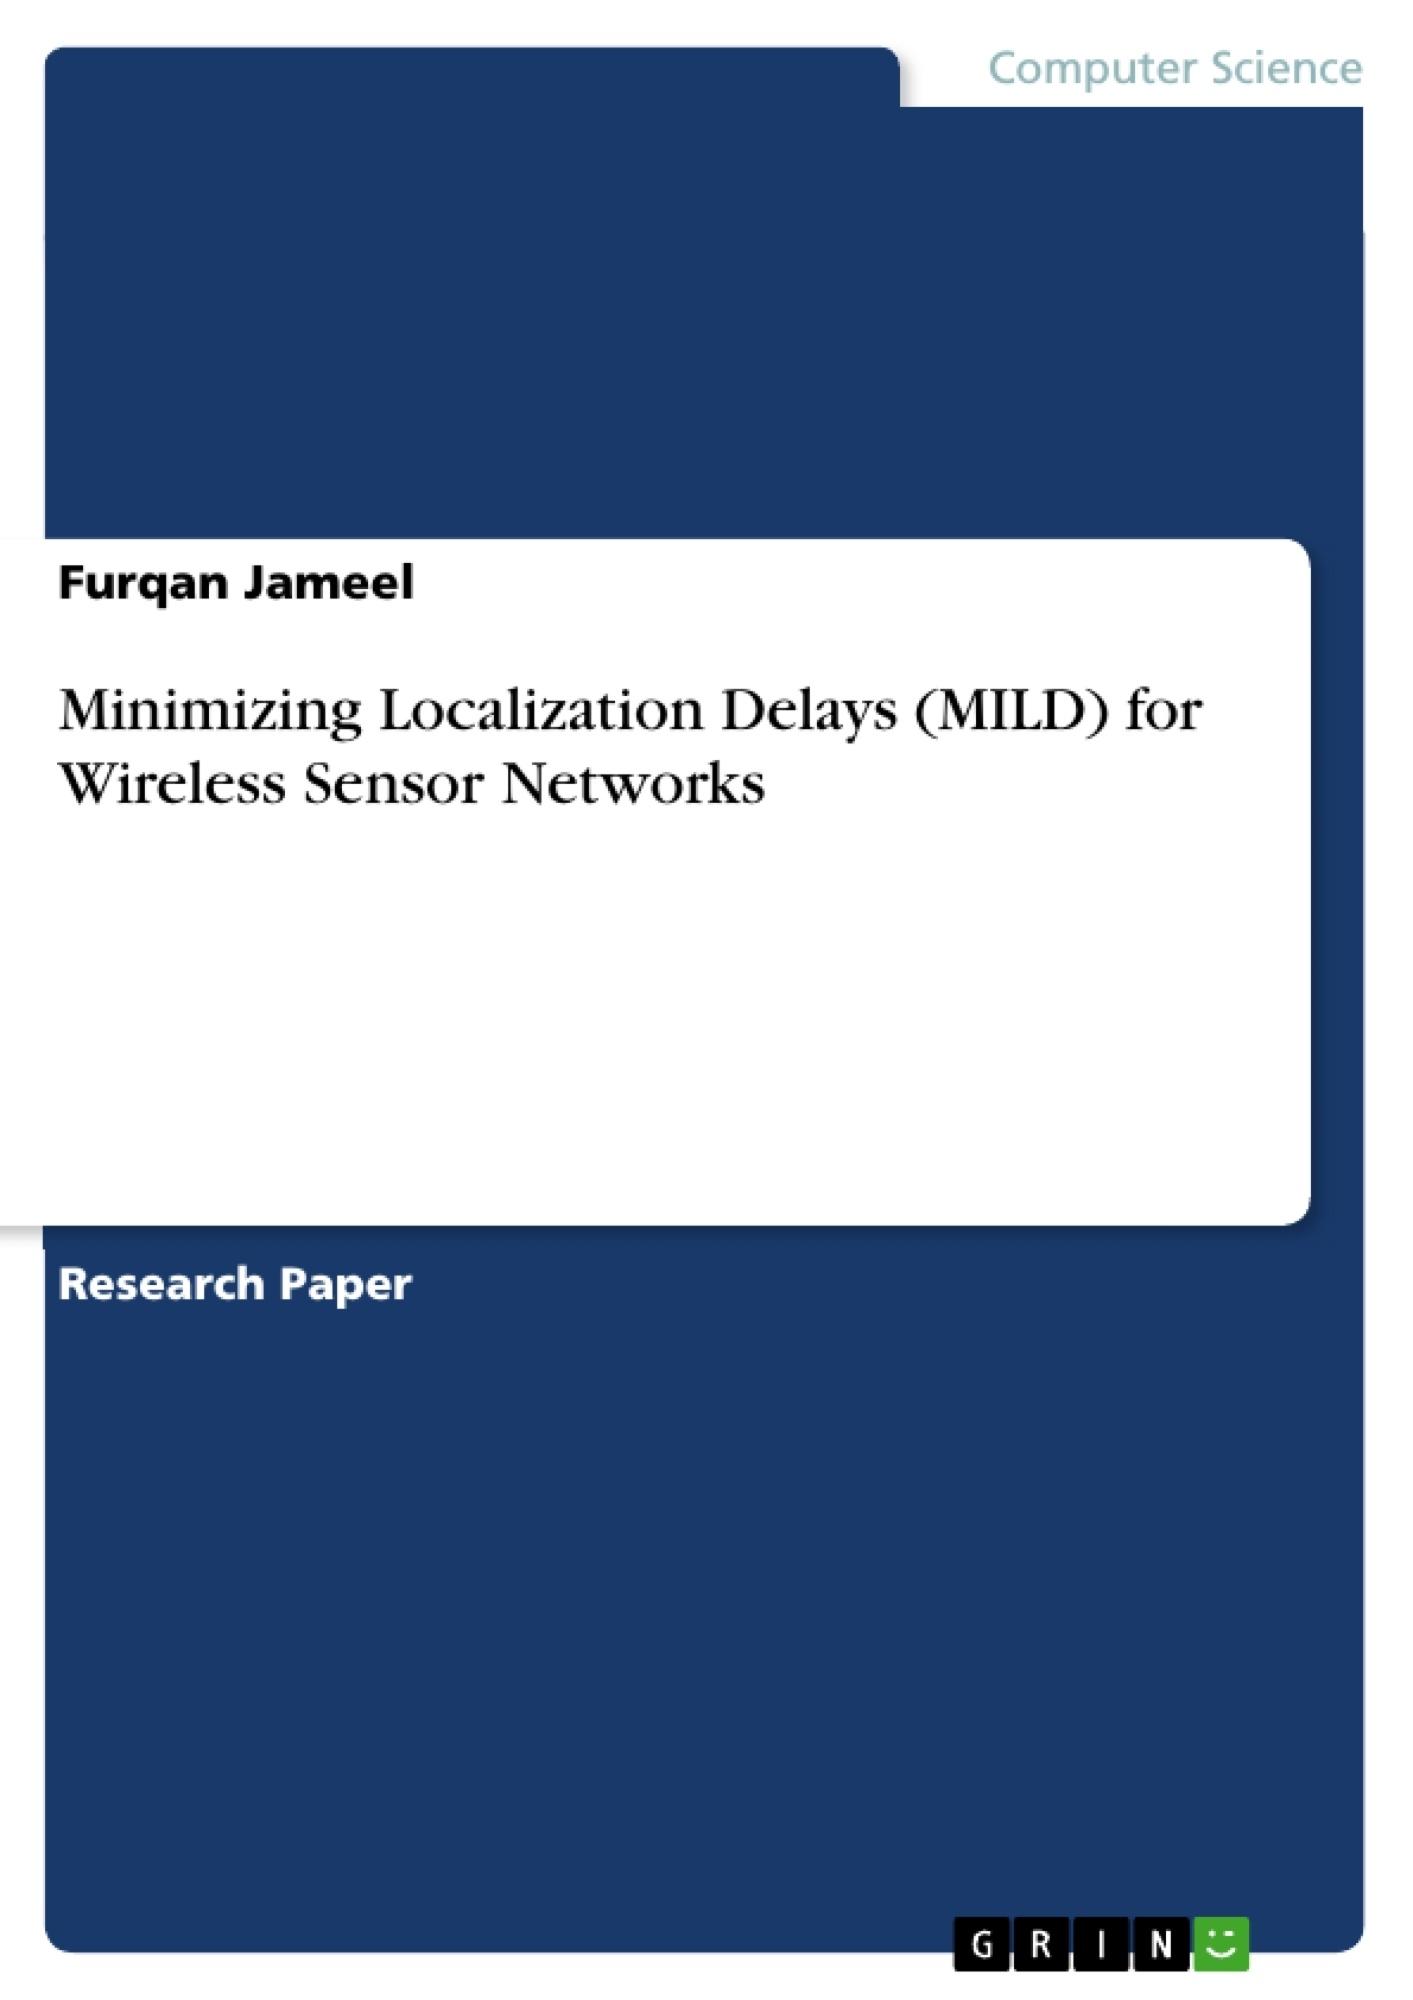 Title: Minimizing Localization Delays (MILD) for Wireless Sensor Networks